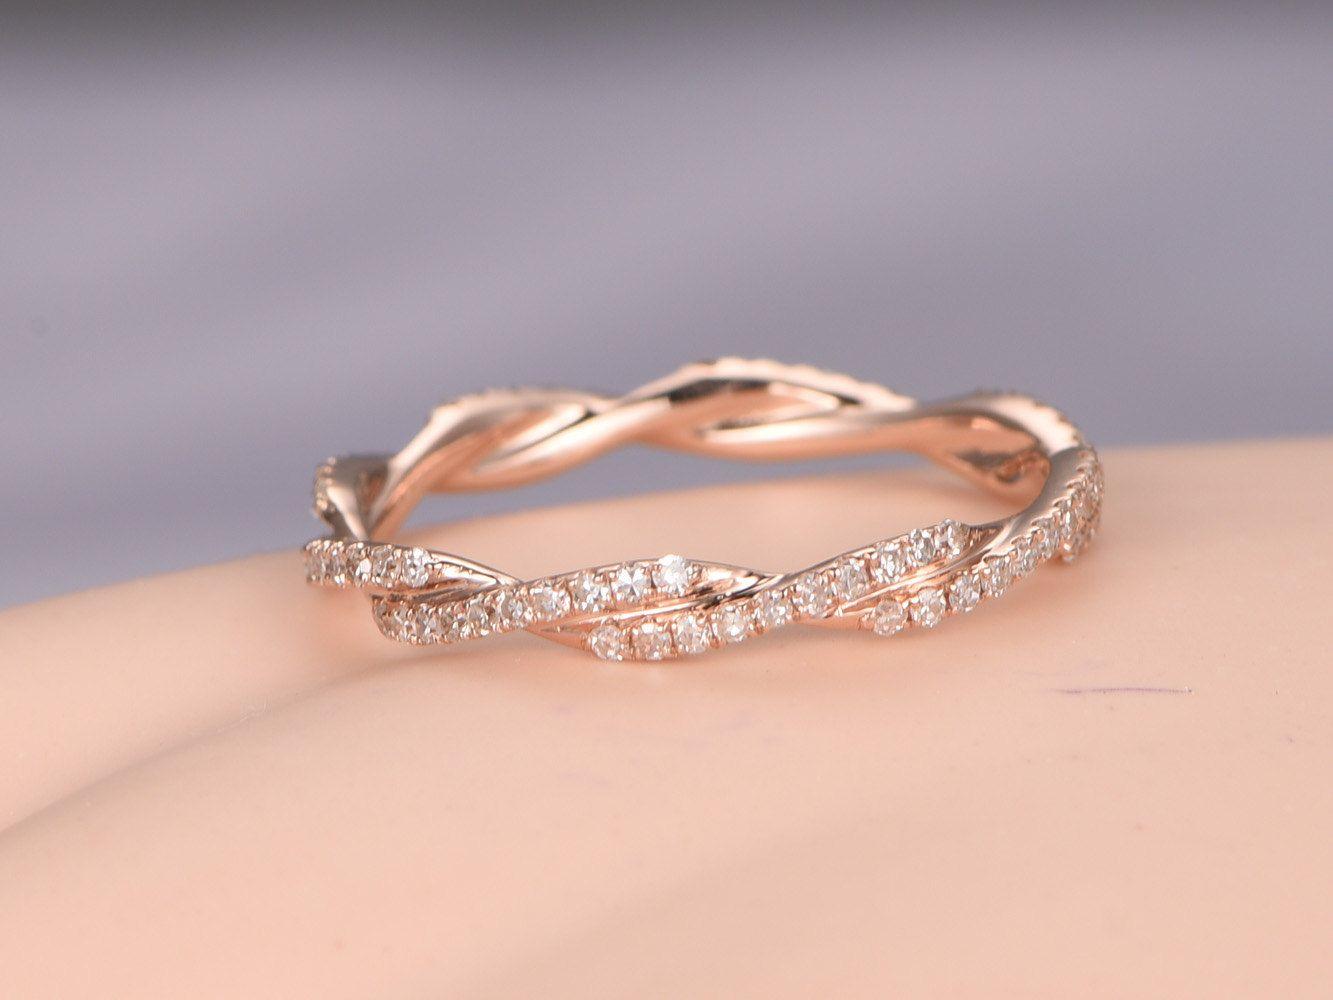 curved wedding band contour diamond wedding band Twisted shape Diamond wedding band 14k rose gold FULL eternity ring engagement ring